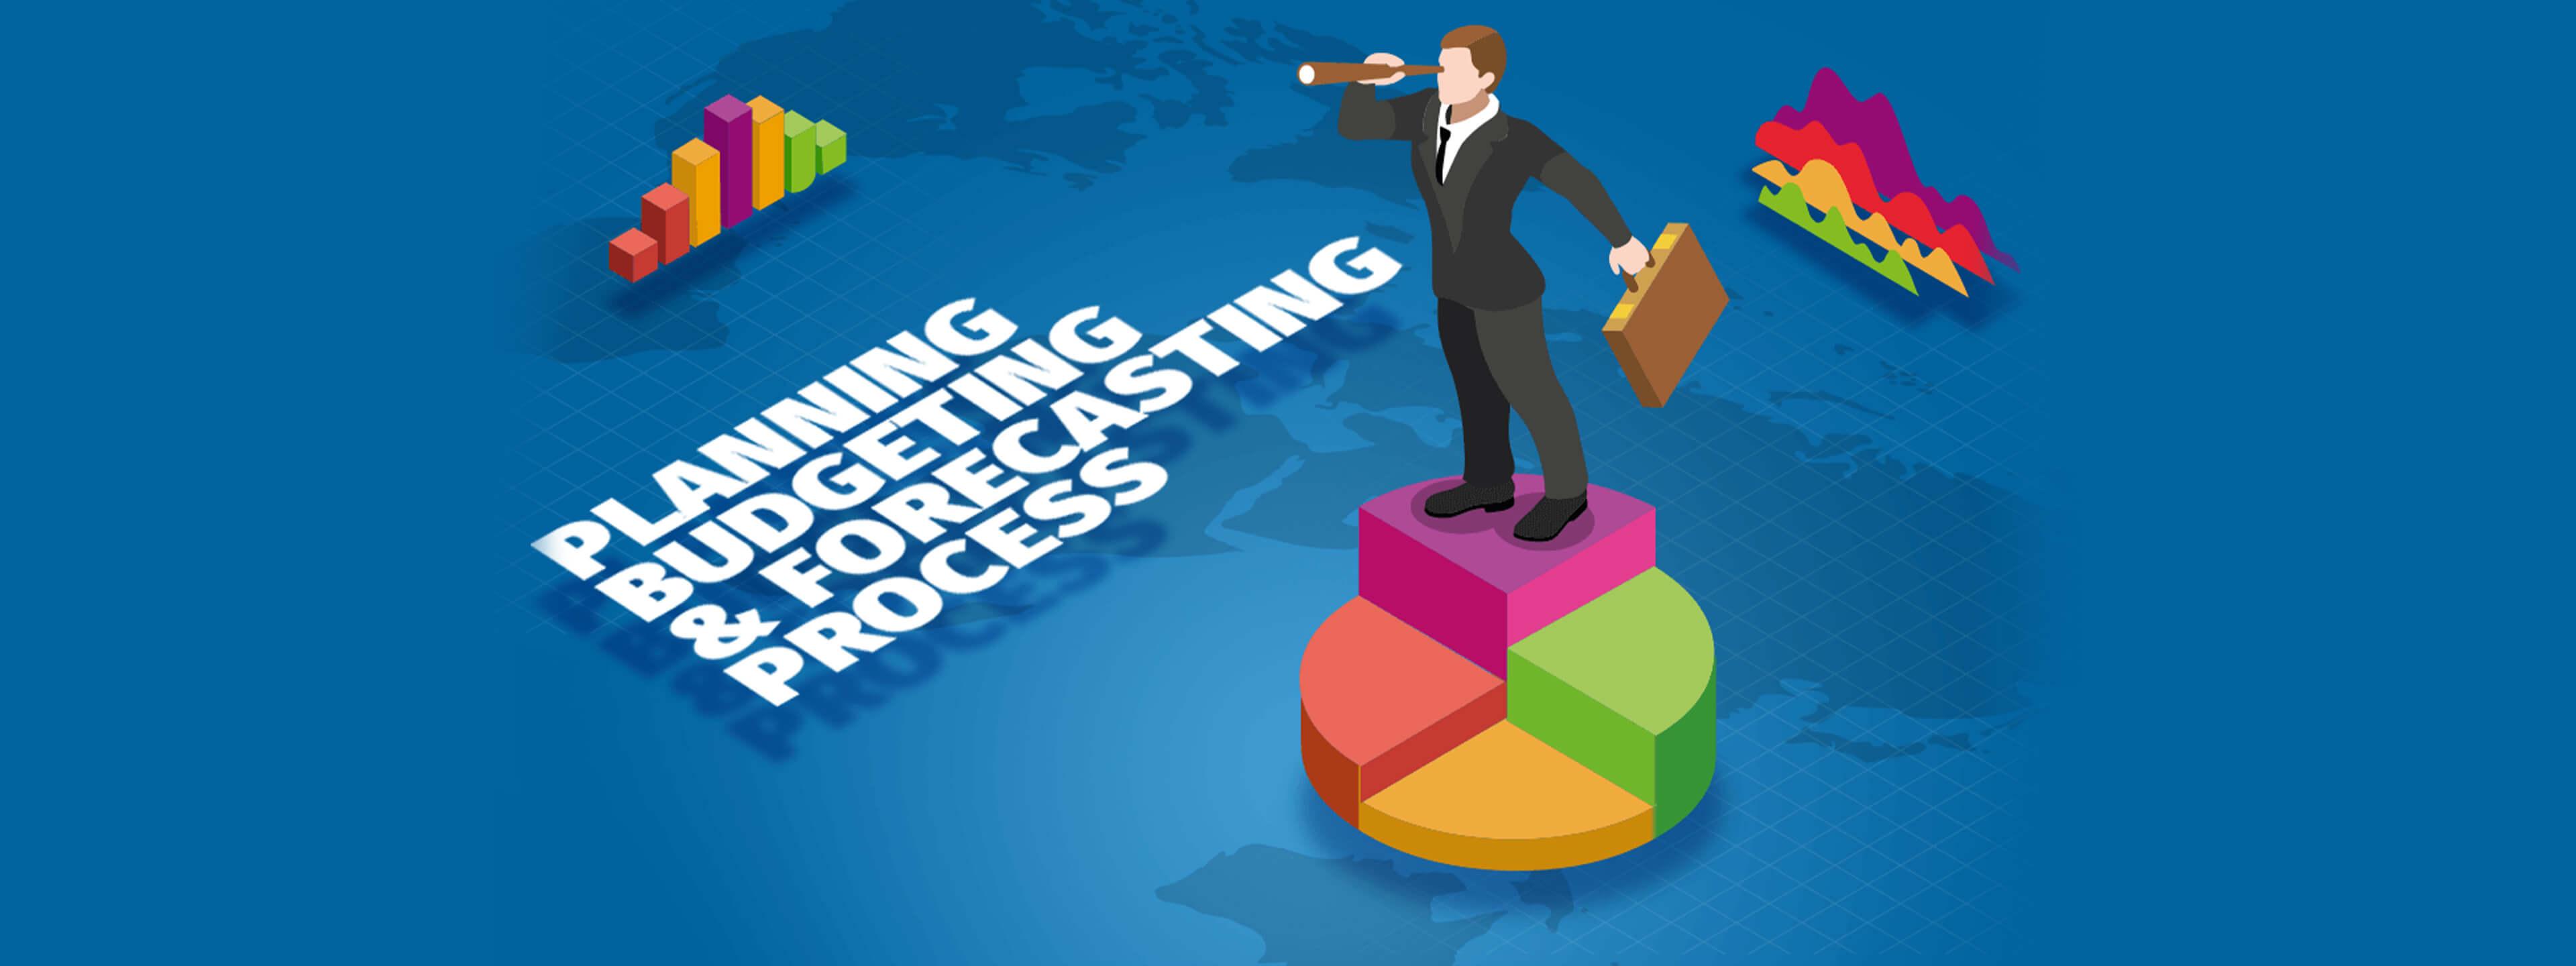 Planning, Budgeting & Forecasting Process